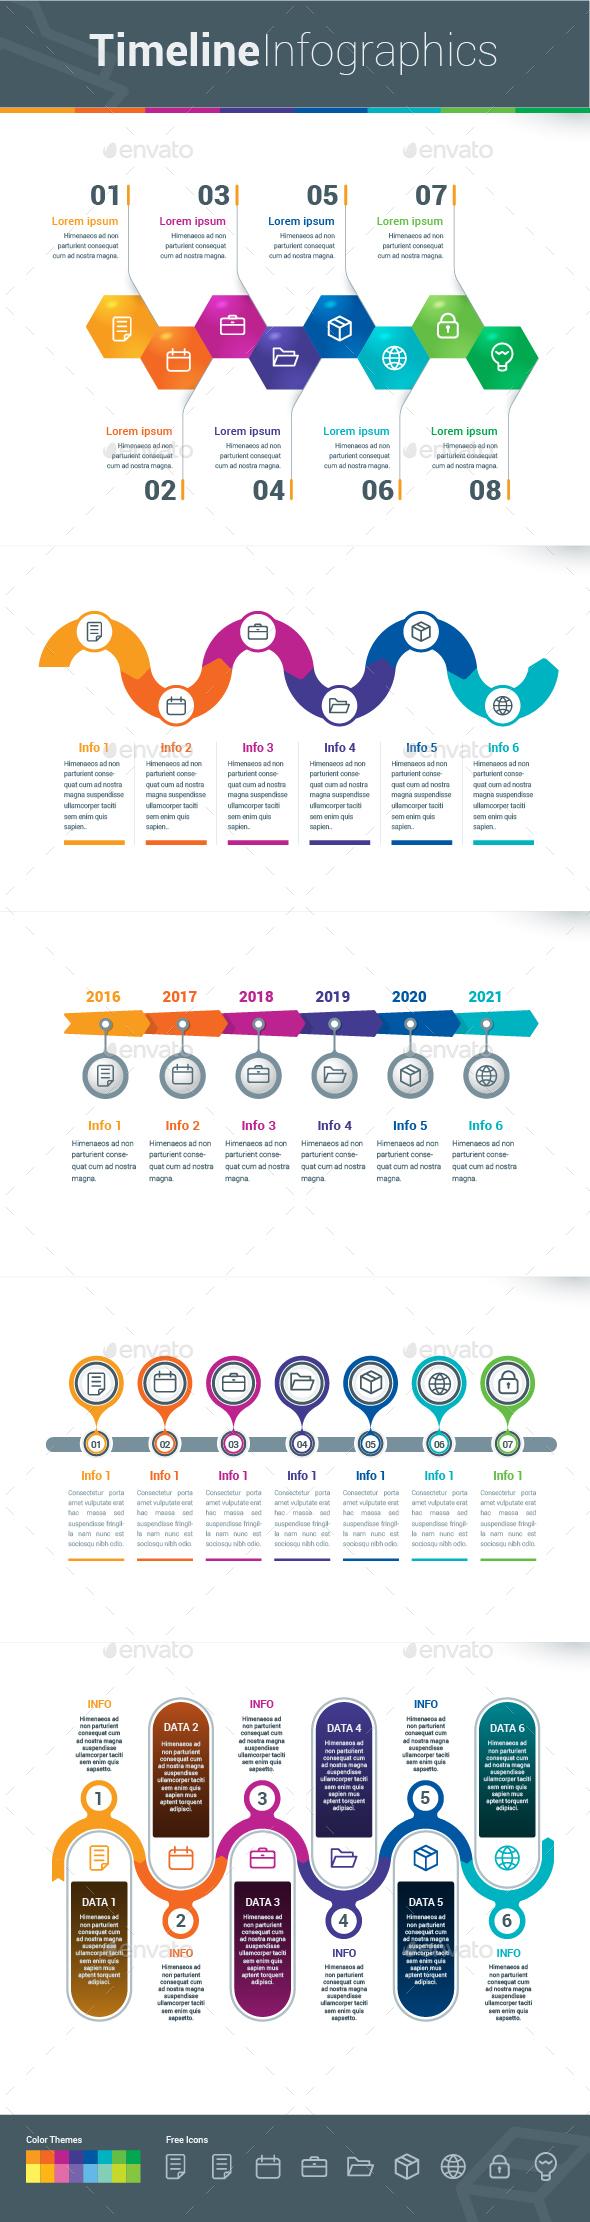 Infographic Elements - Timeline - Infographics